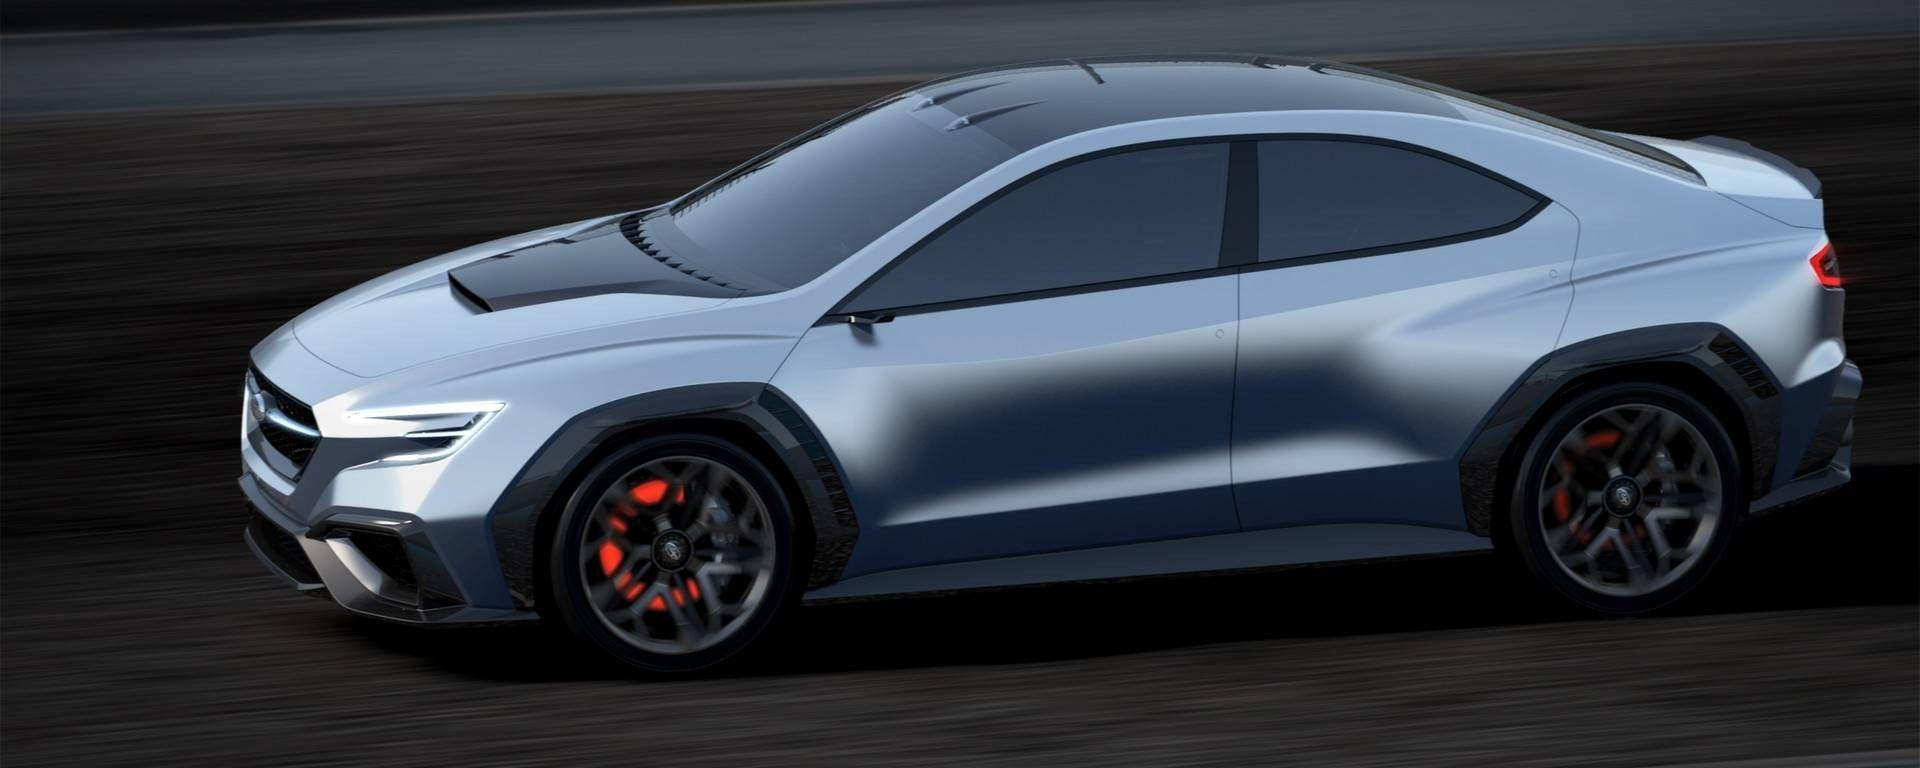 Subaru Vizis Performance Concept - visuale laterale